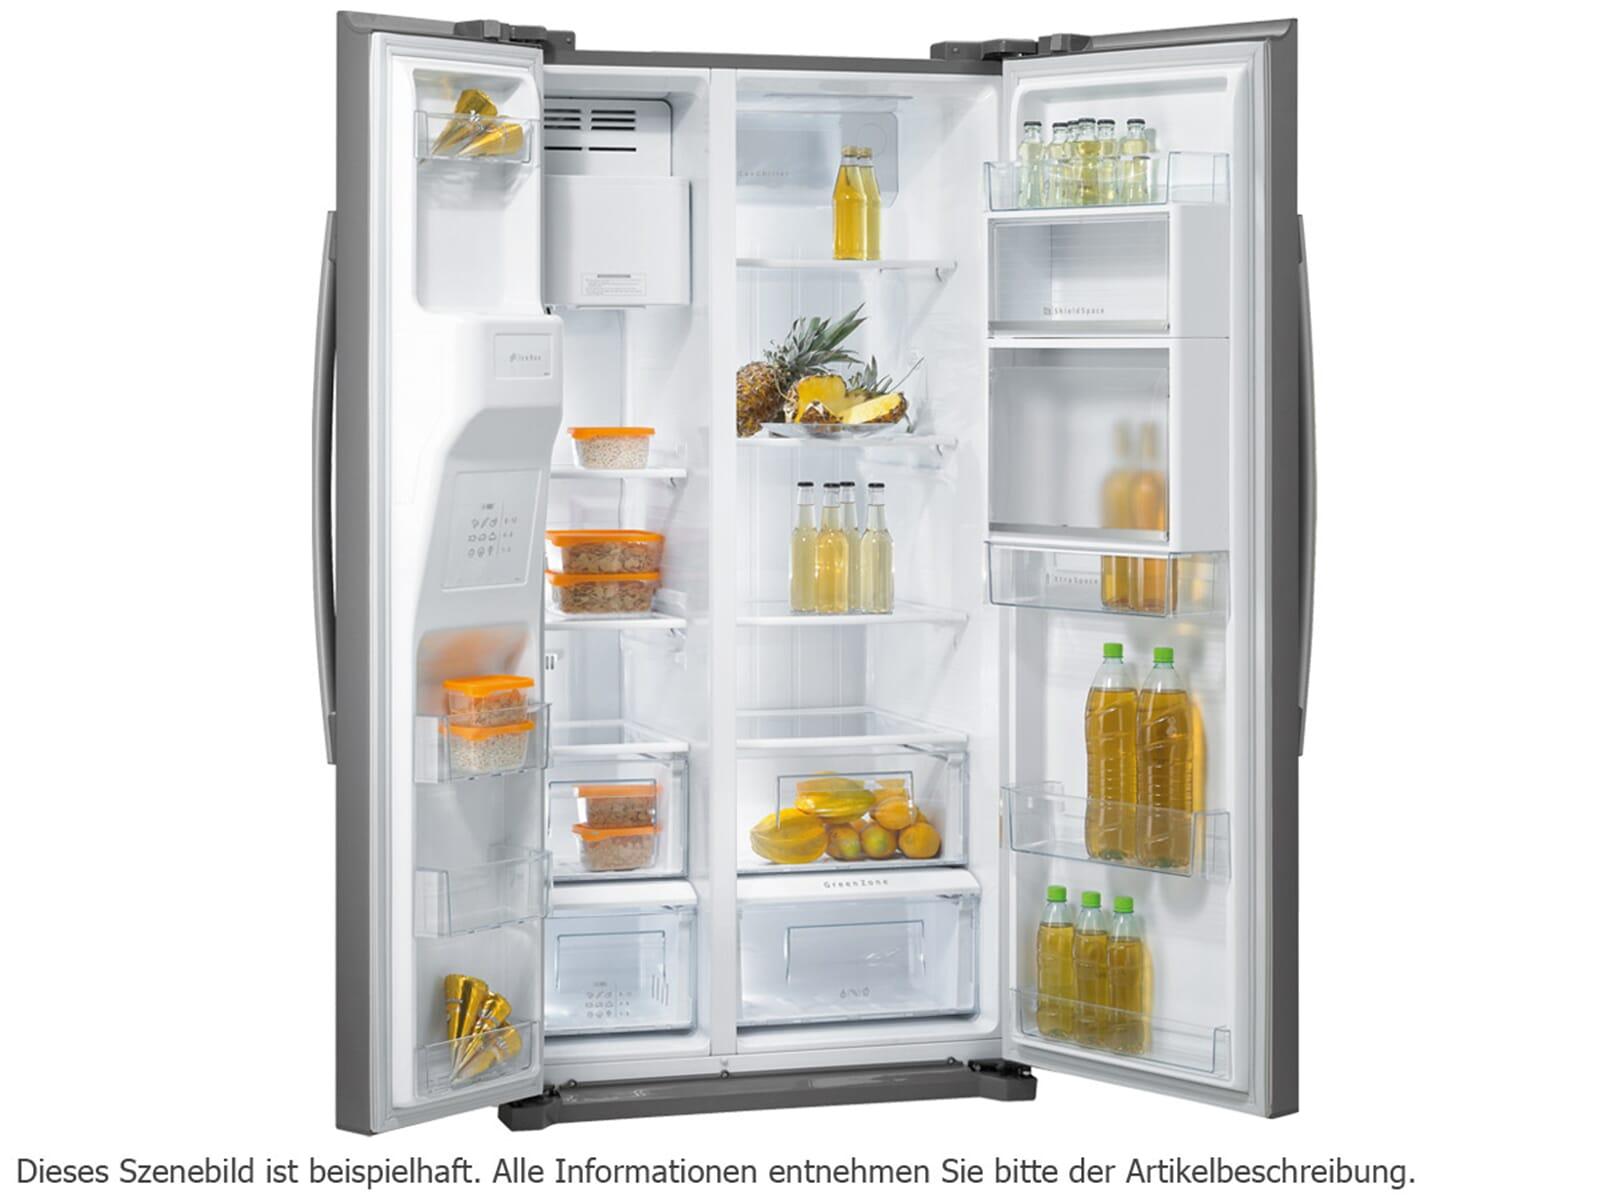 Gorenje Kühlschrank Xxl : Gorenje side by side kühlschrank bosch kühlschrank side by side